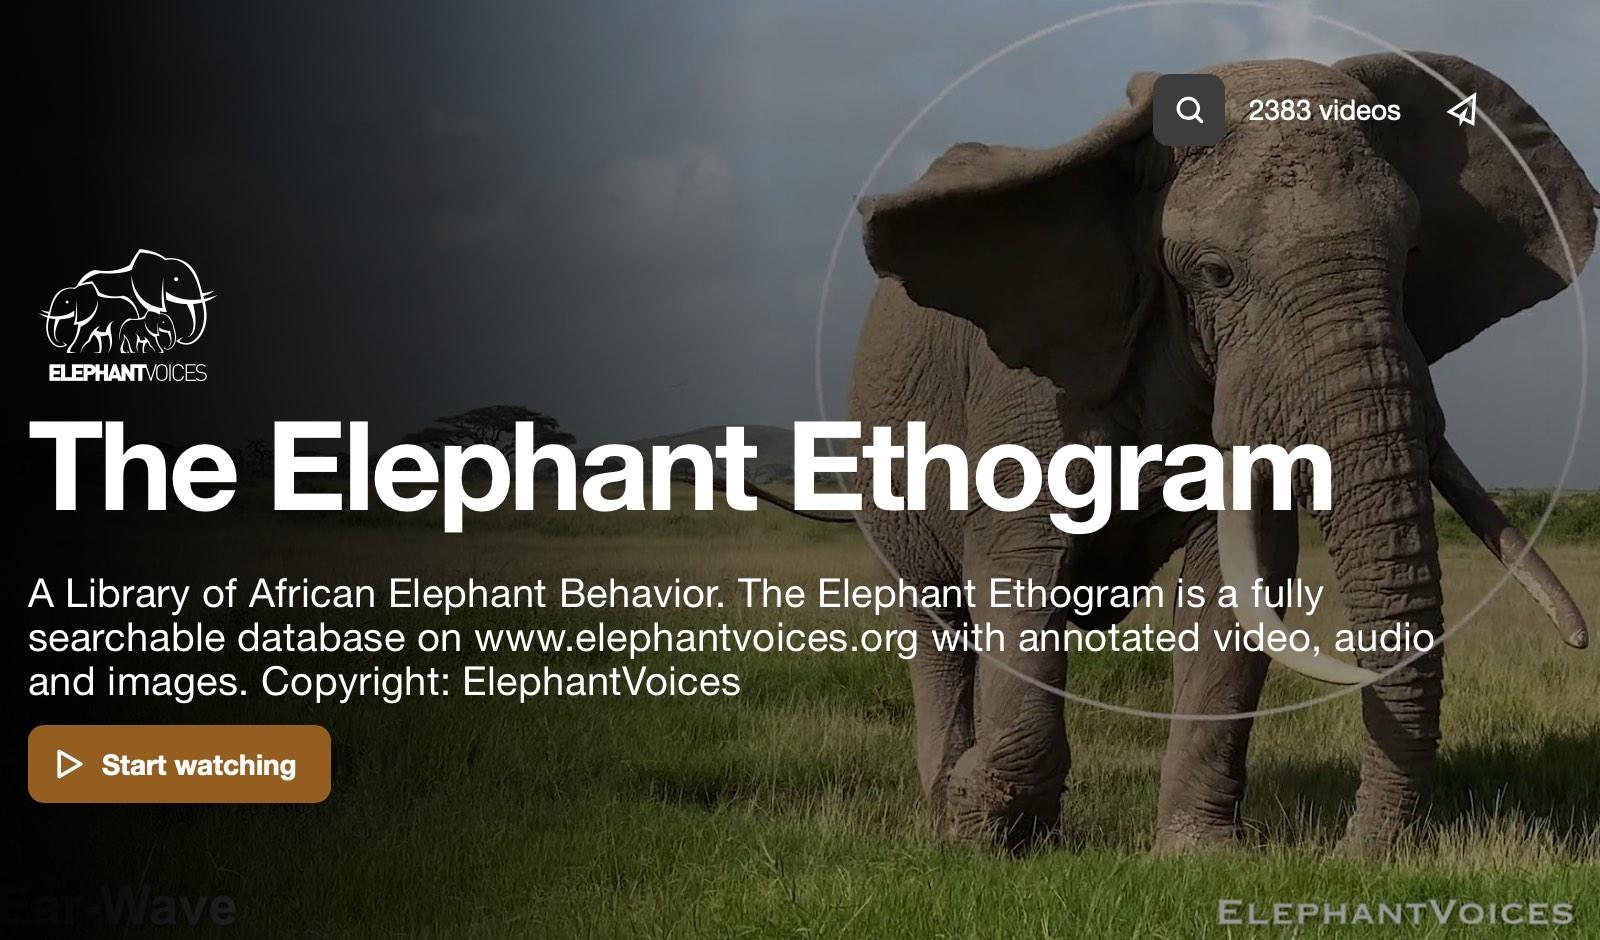 Screenshot from The Elephant Ethogram